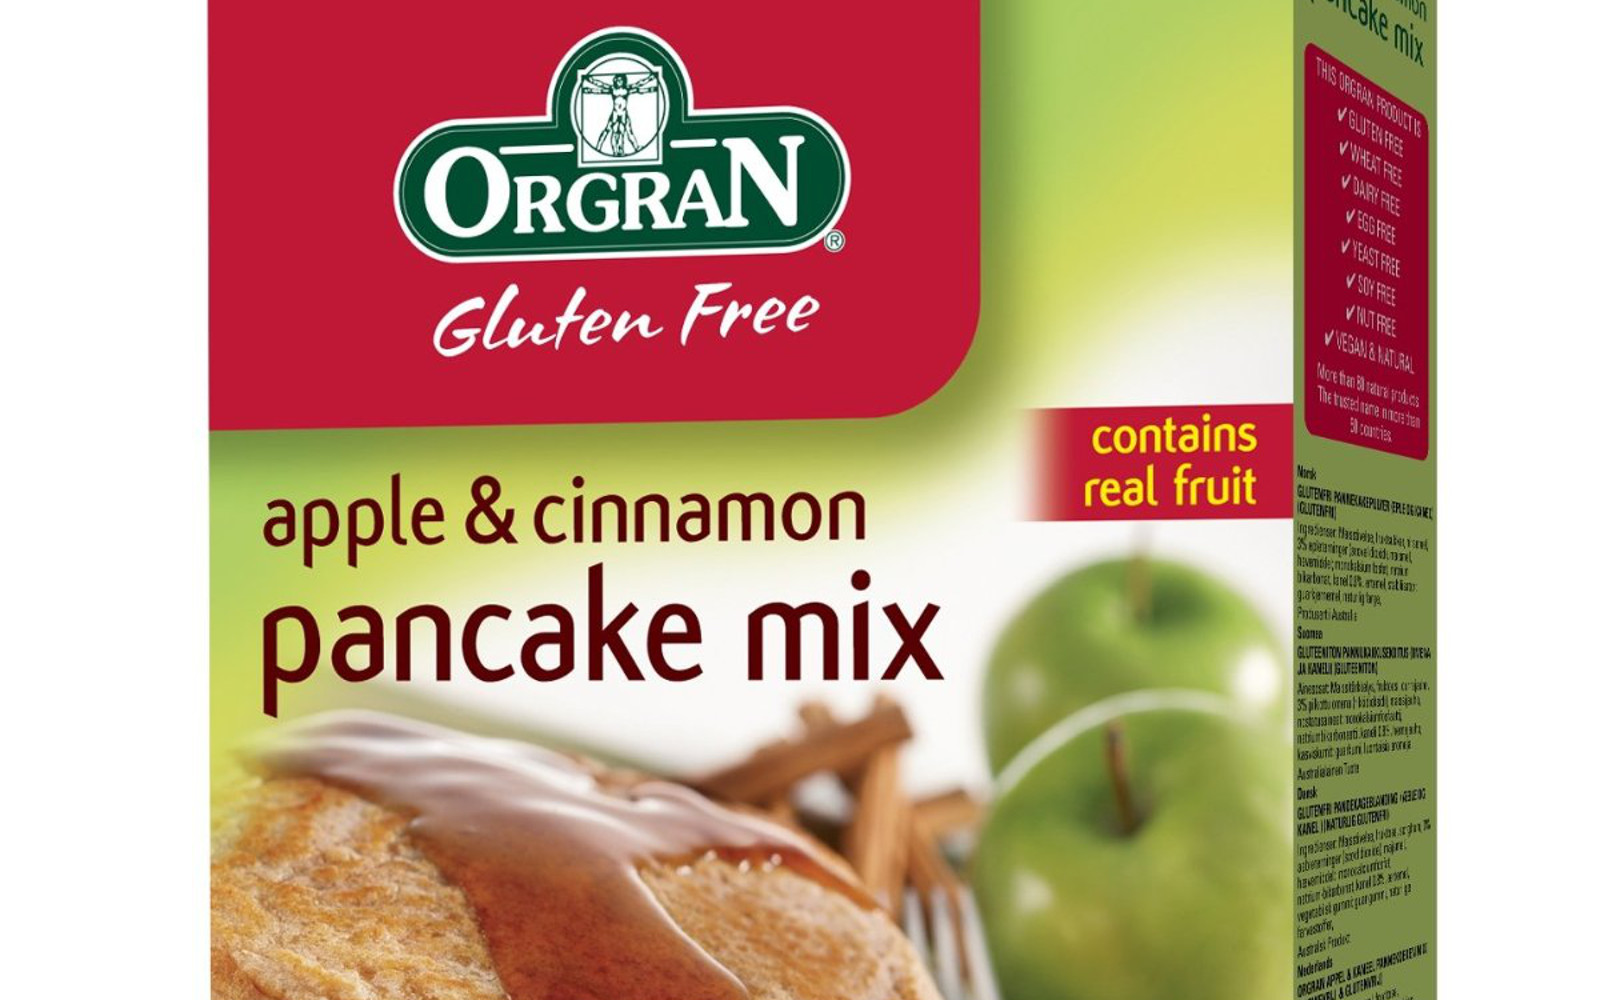 Orgran Apple Cinnamon Pancakes